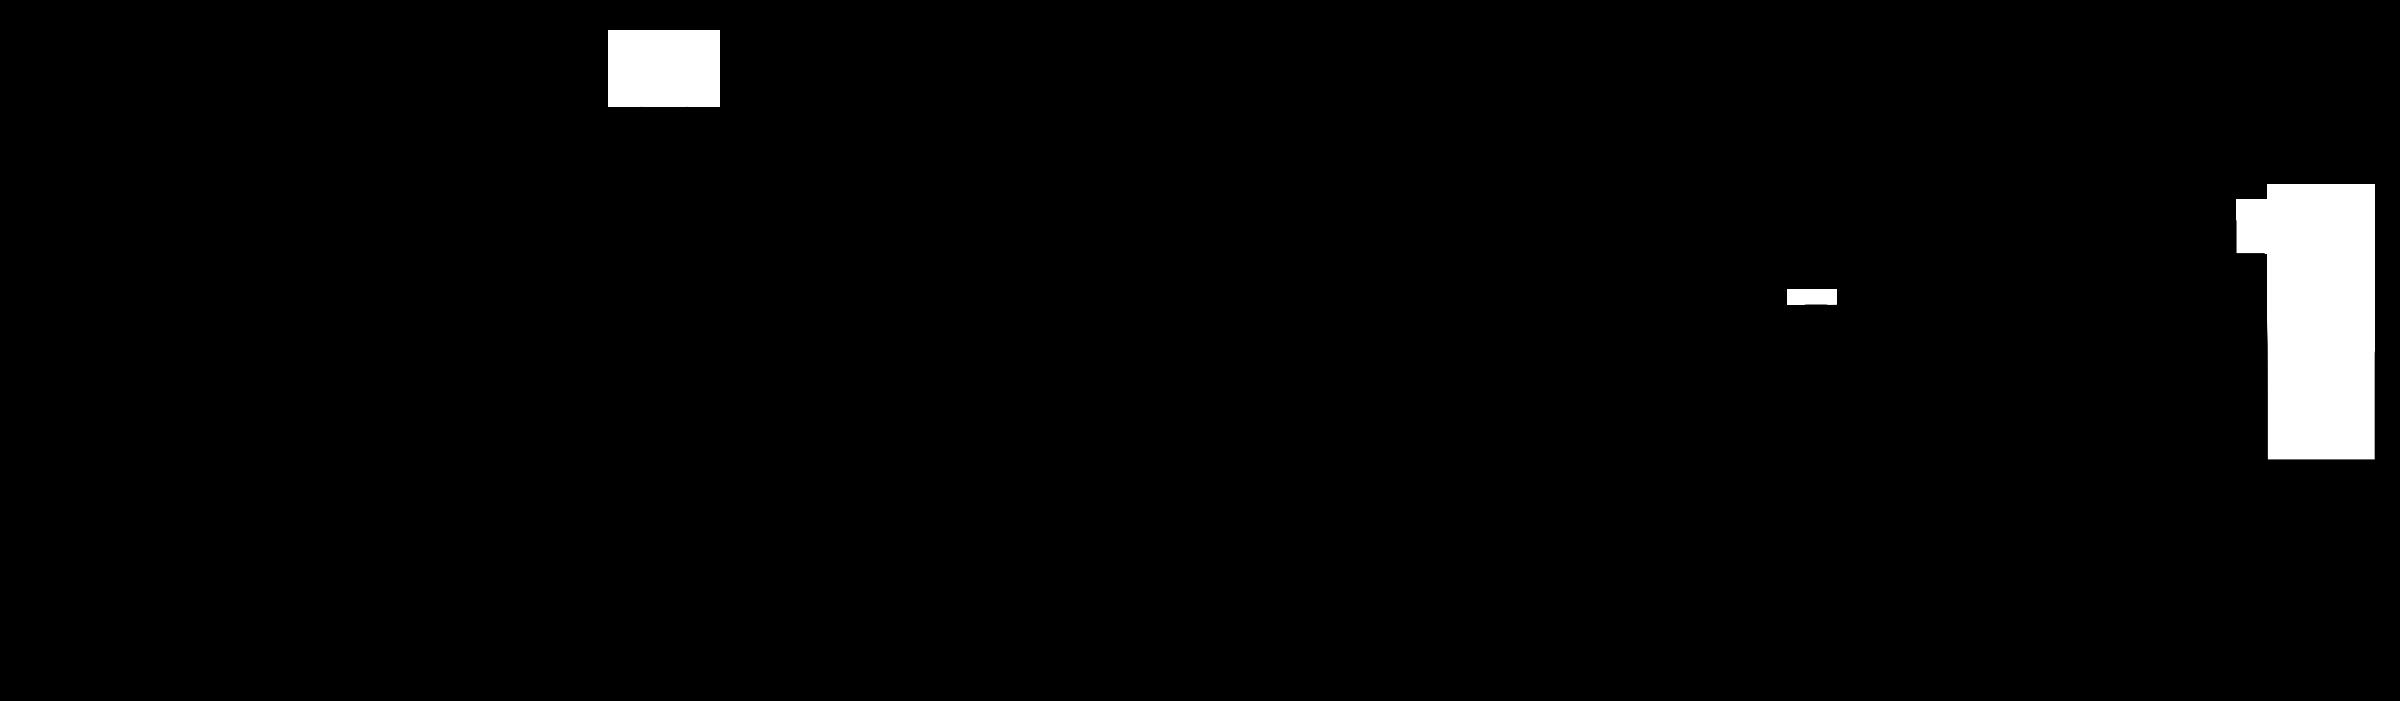 2400x701 Clipart